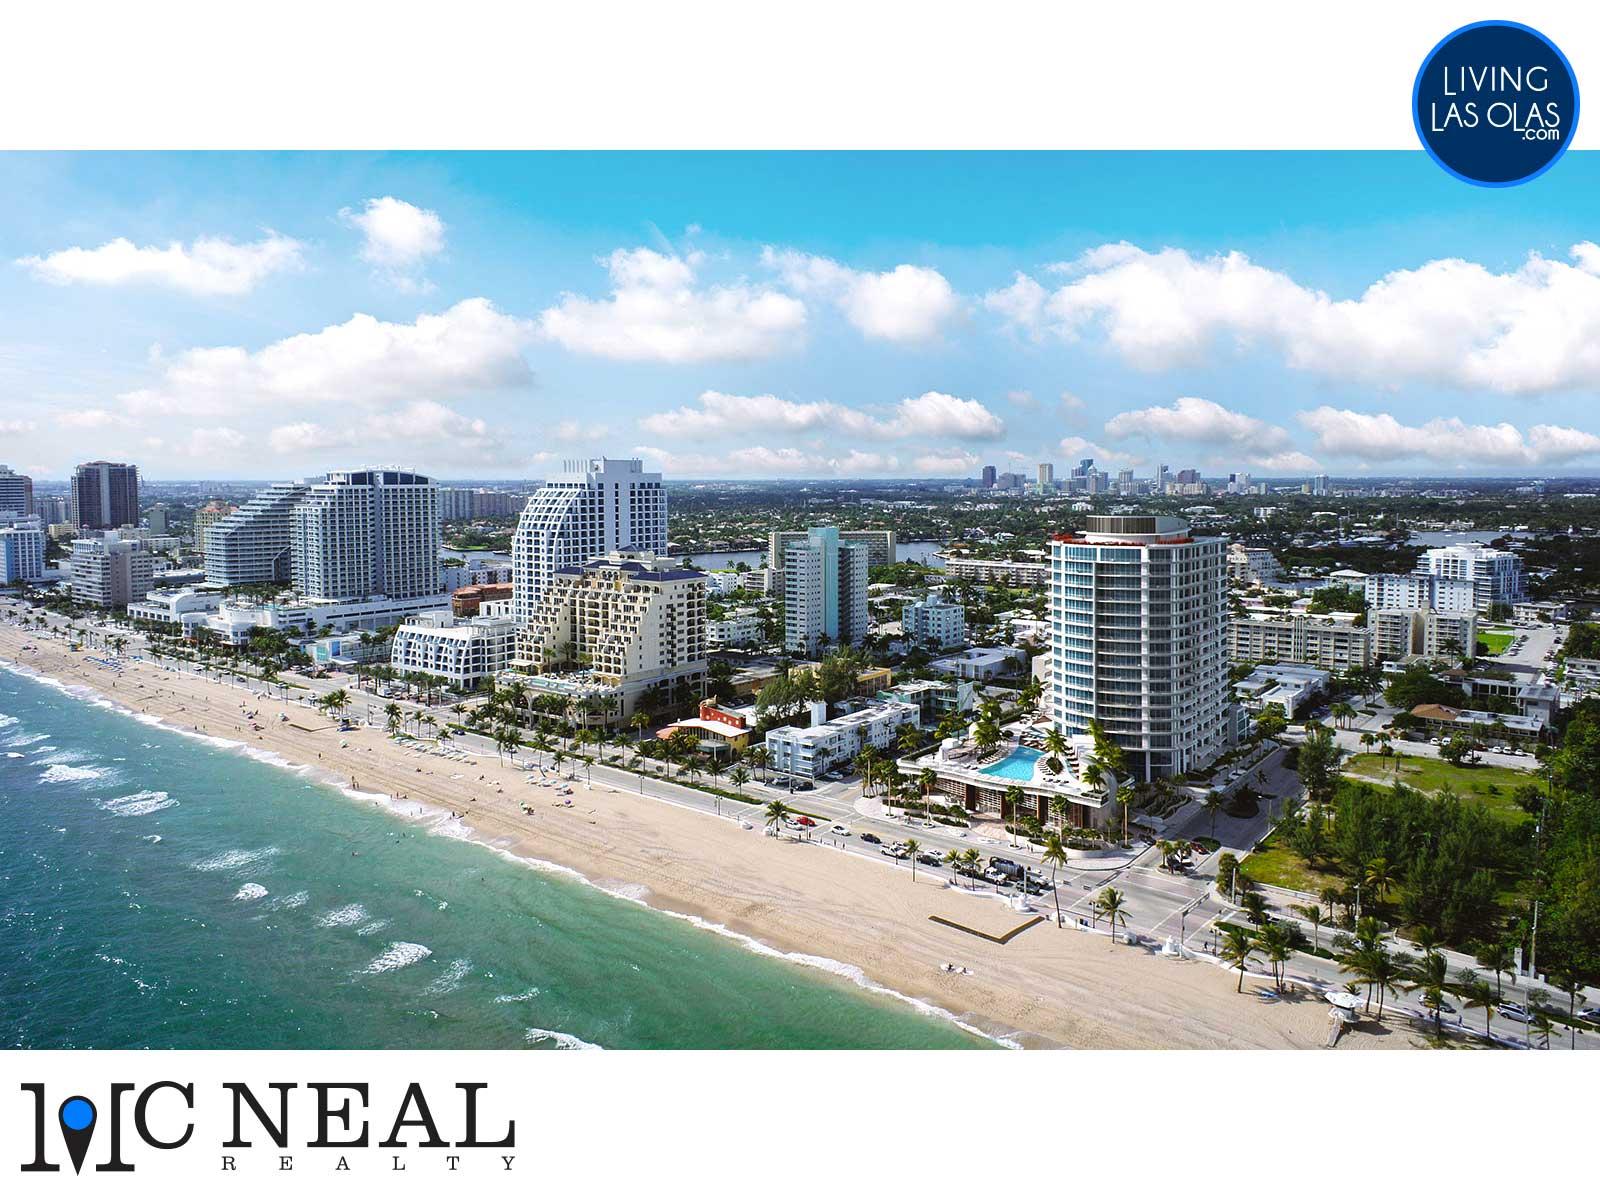 Paramount Fort Lauderdale Beach Condos Images 01